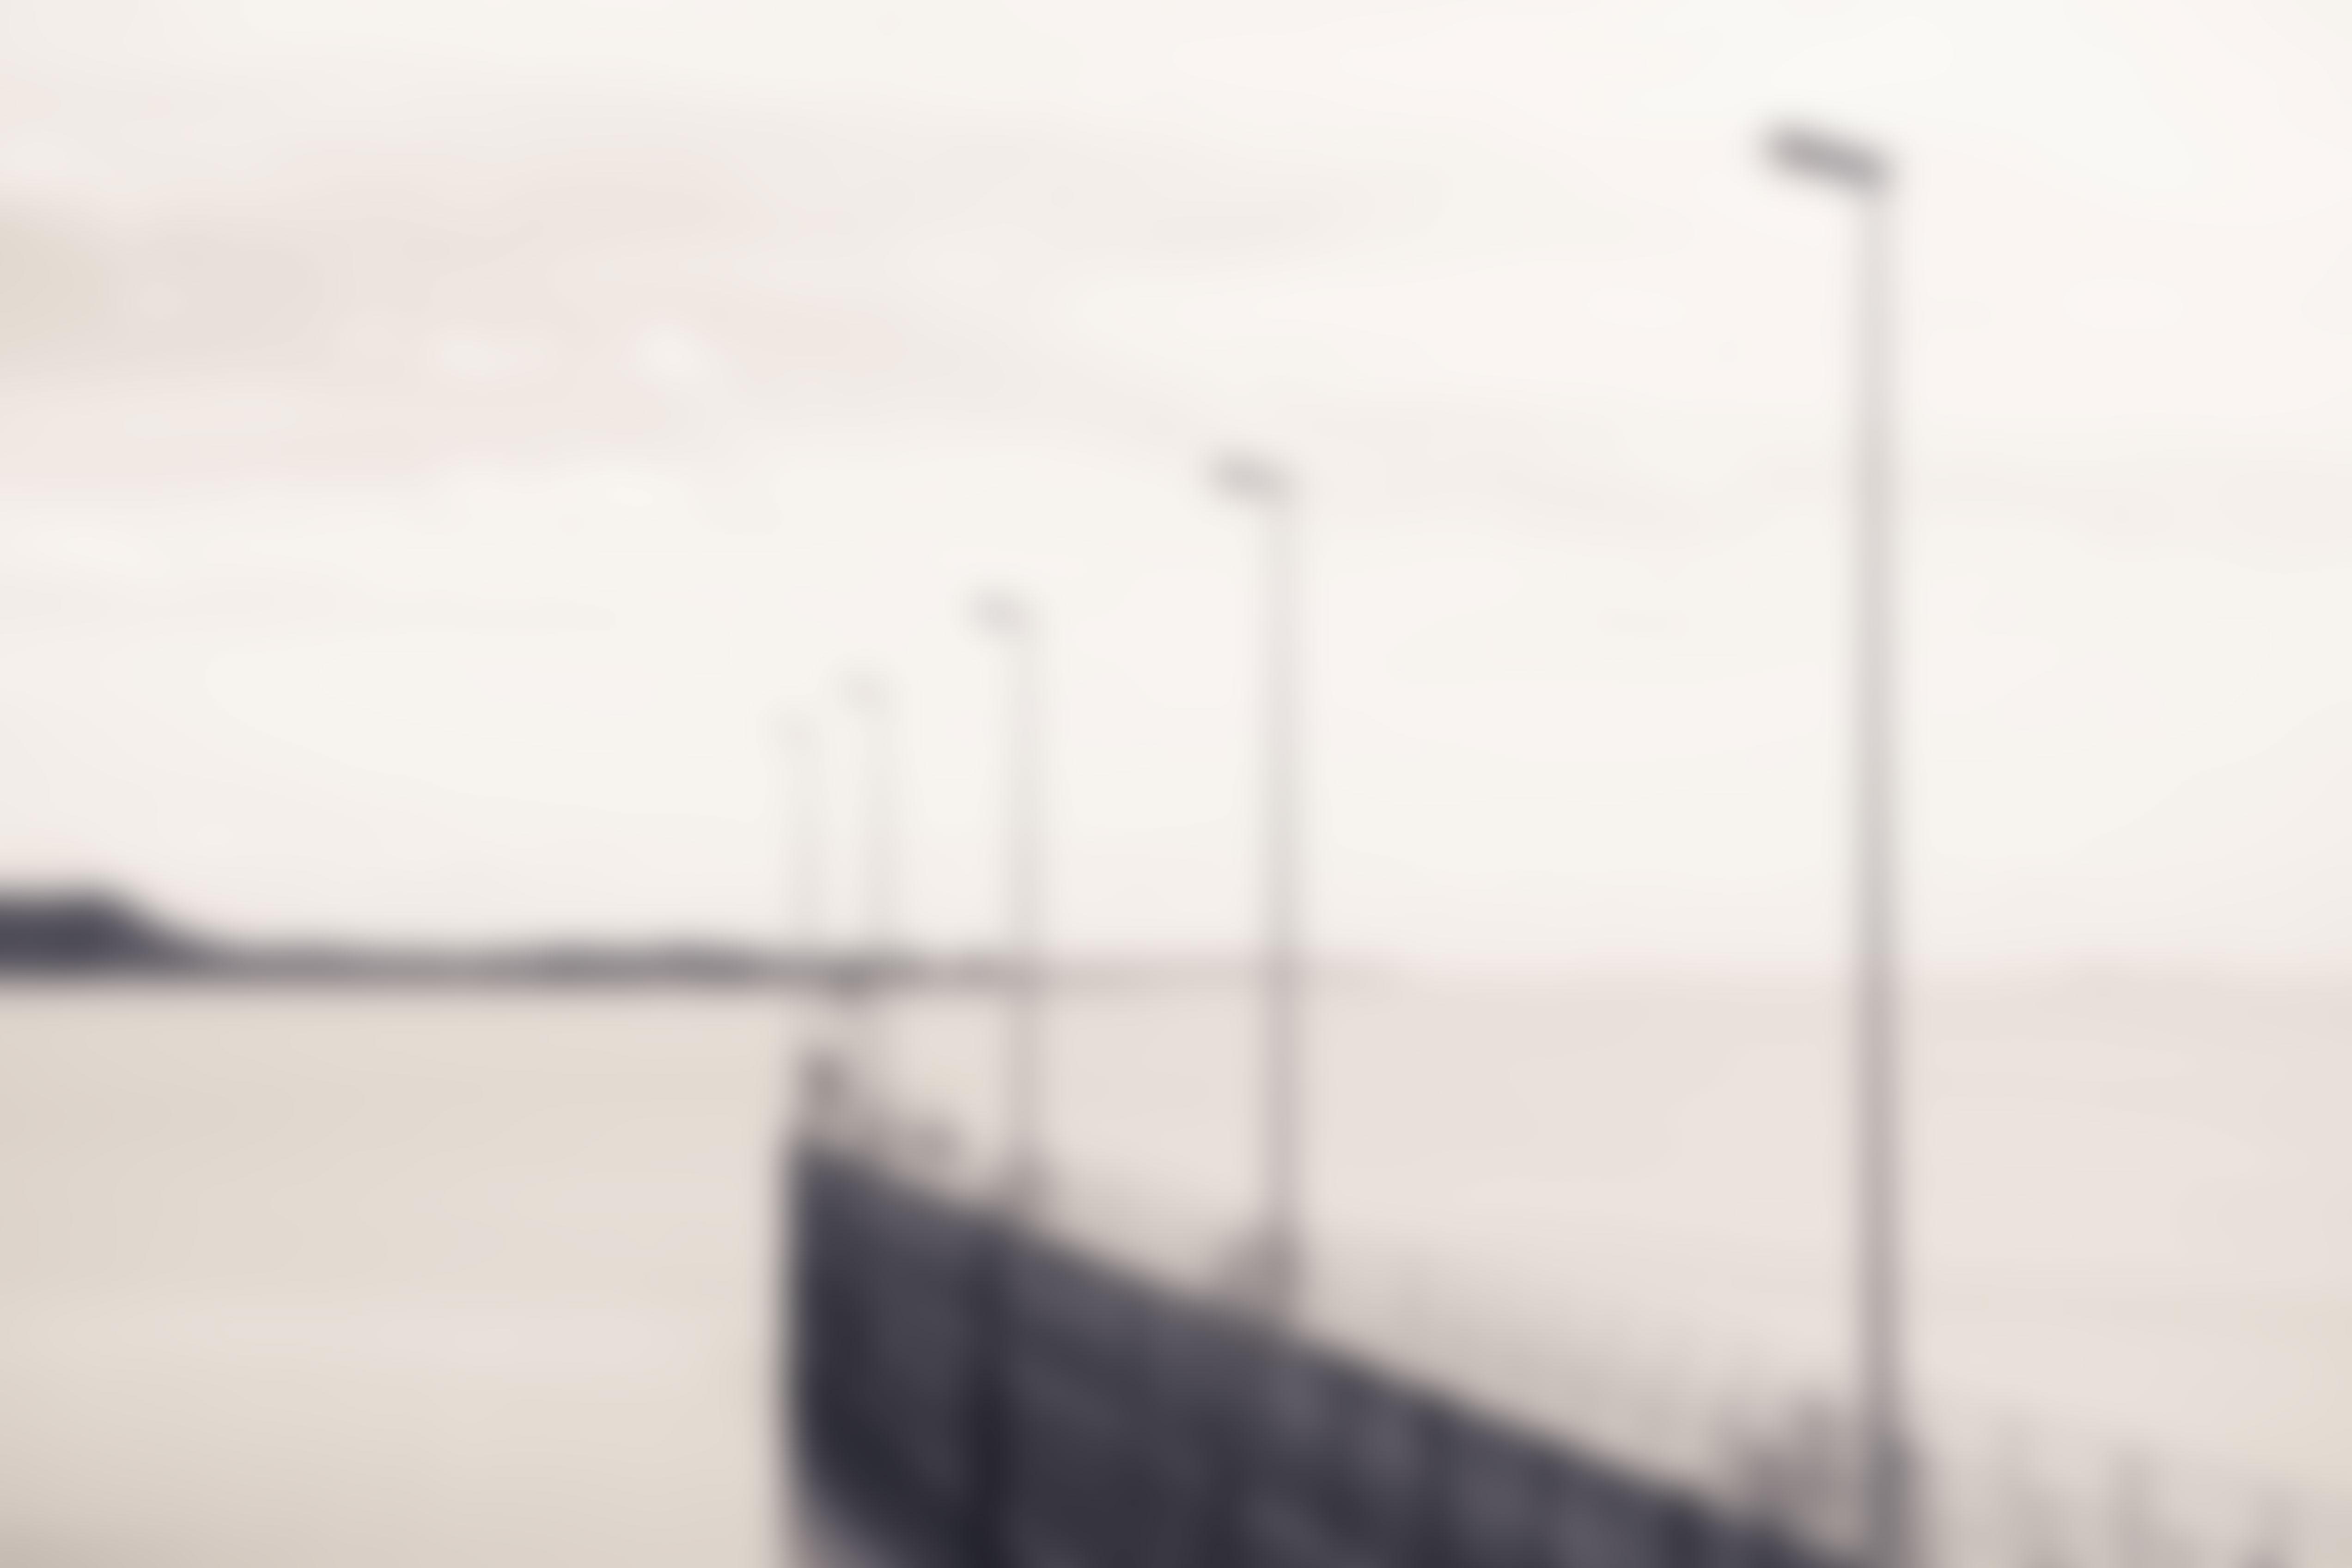 bg-01-blur